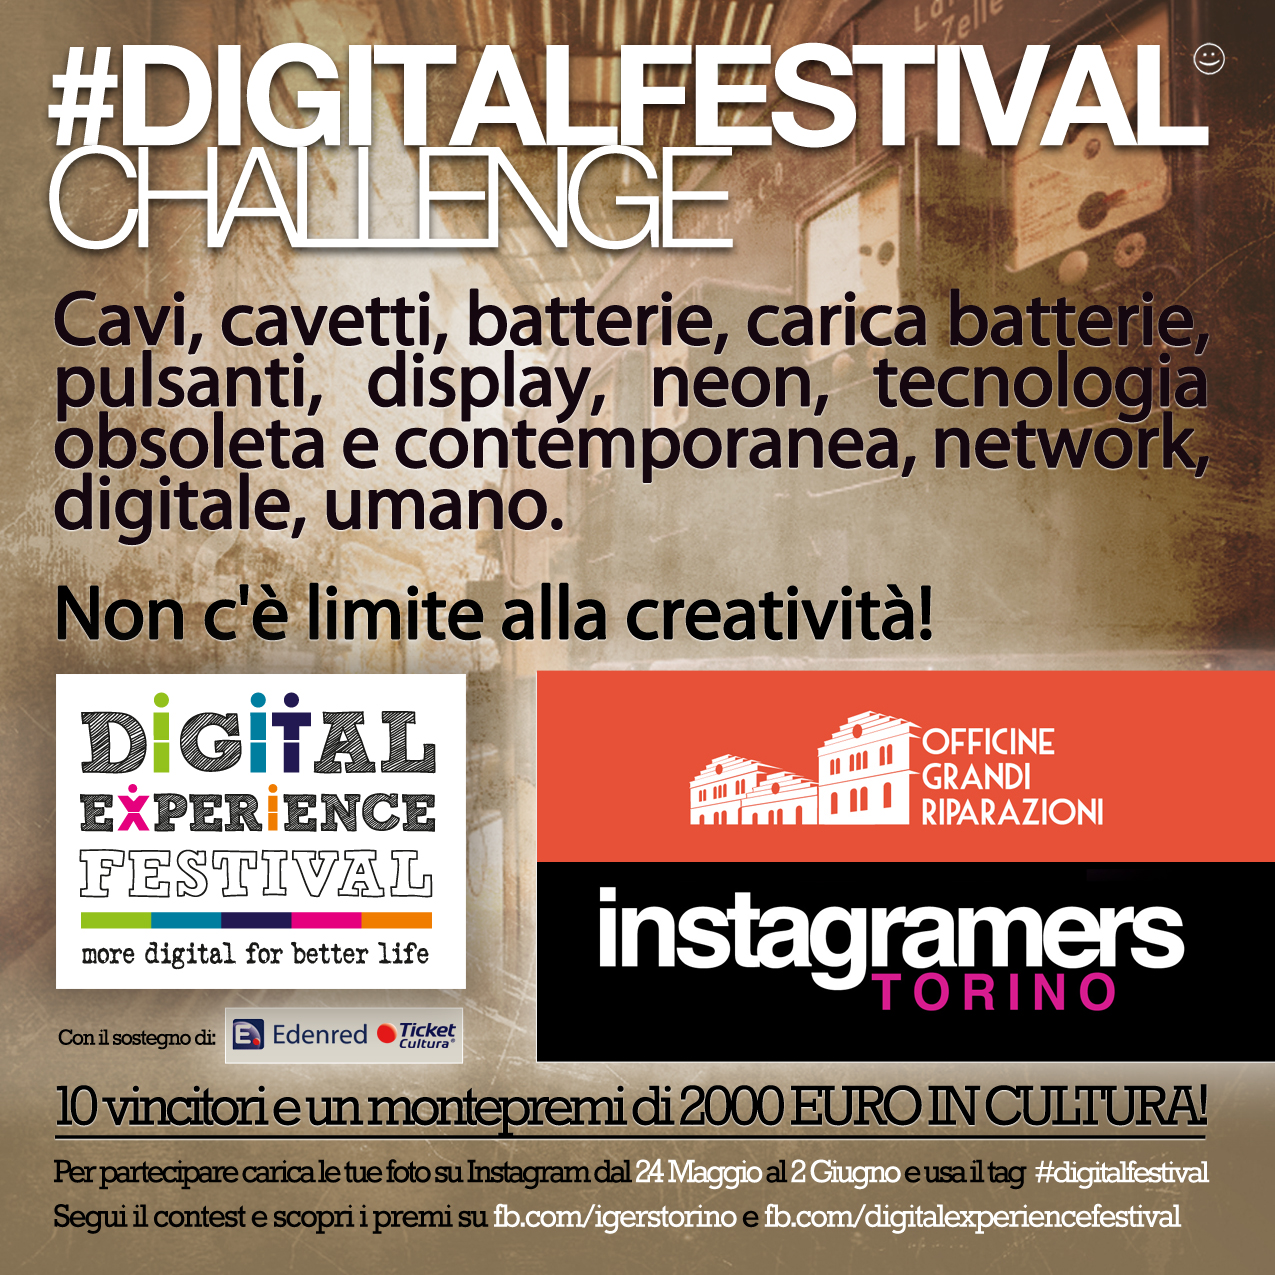 Digital Festival Challenge con Instagramers Torino